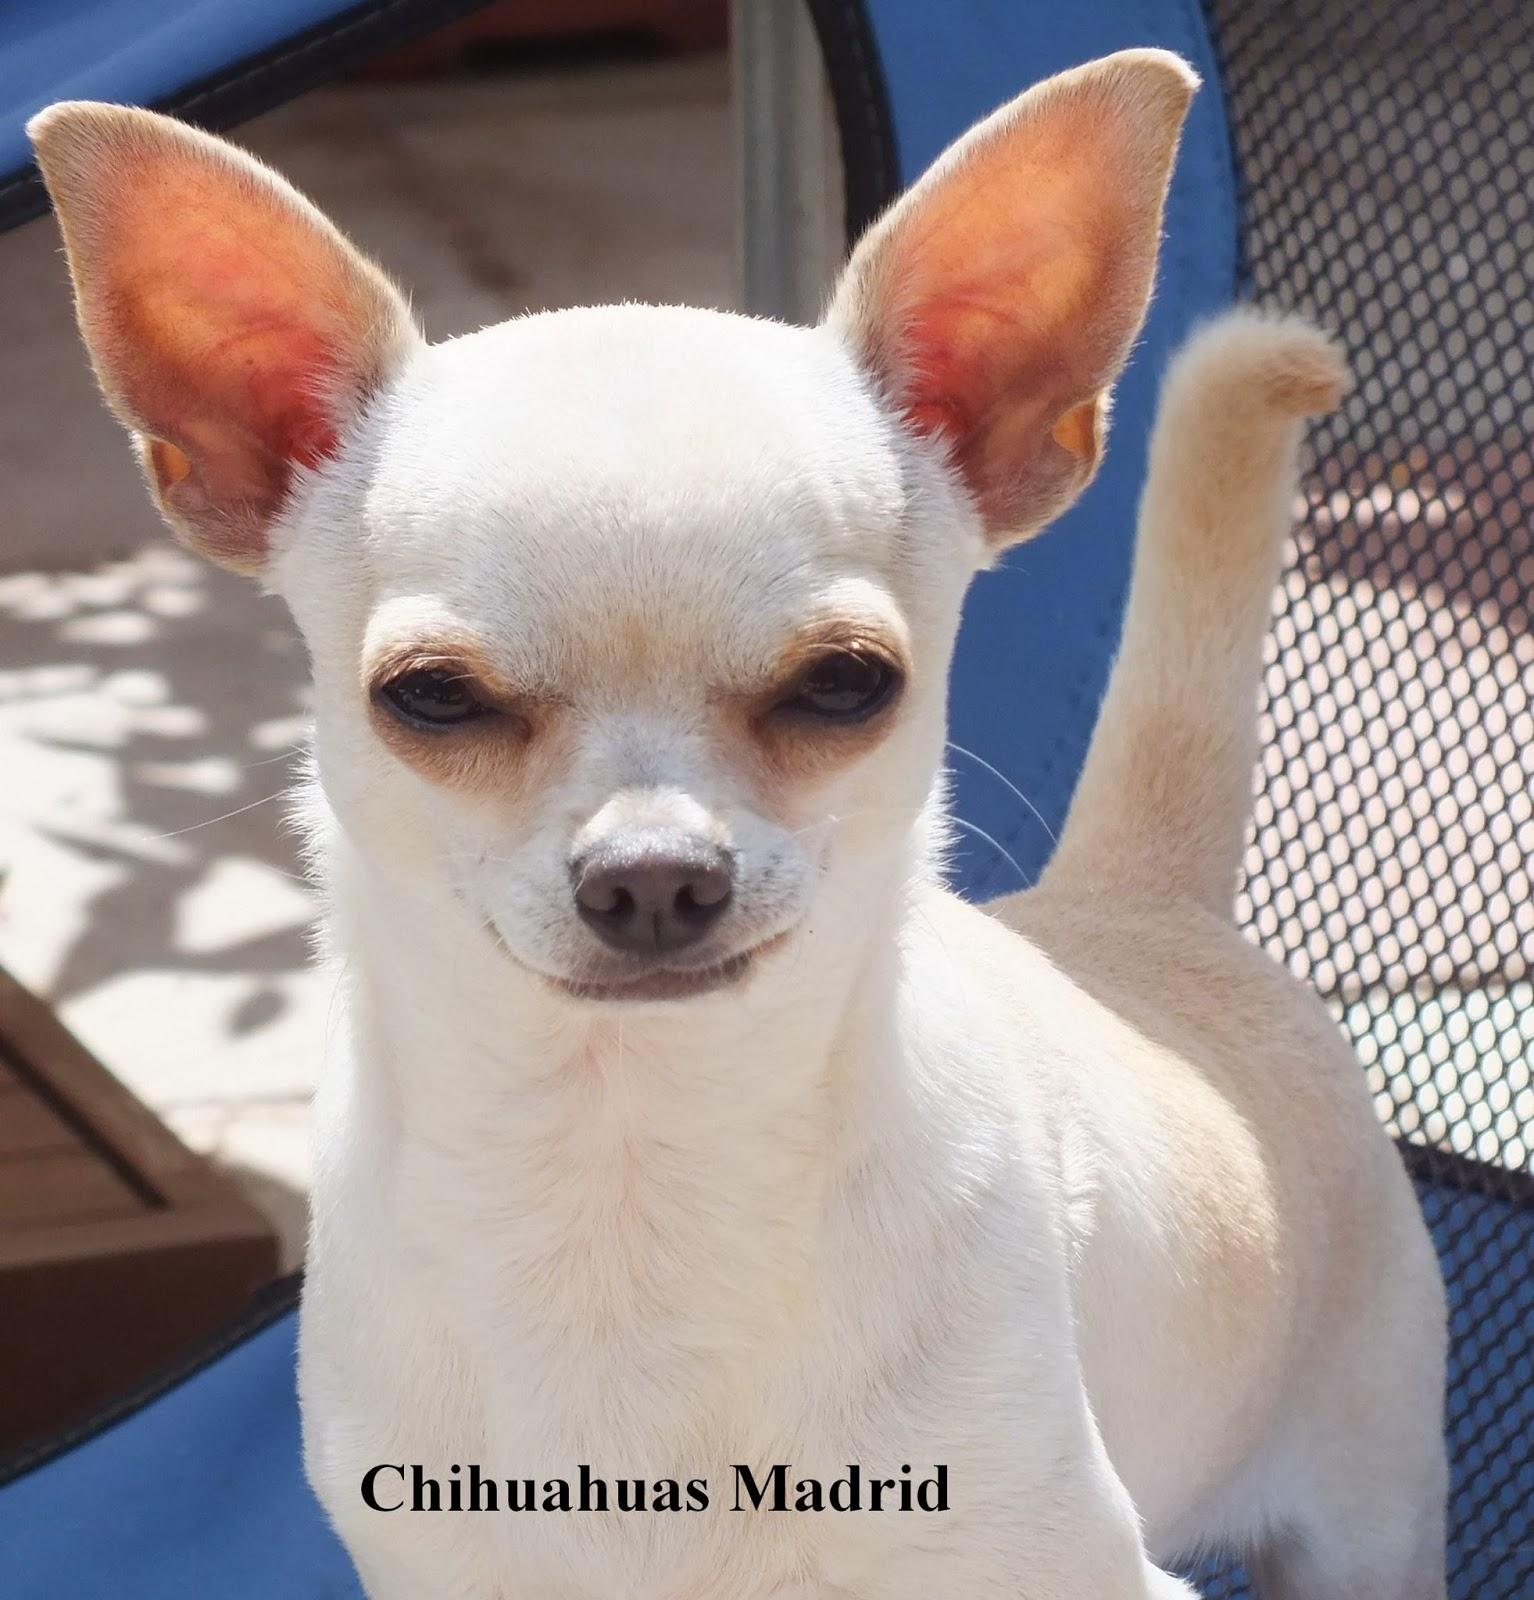 Why Are Chihuahuas Aggressive? - The Chihuahua Life